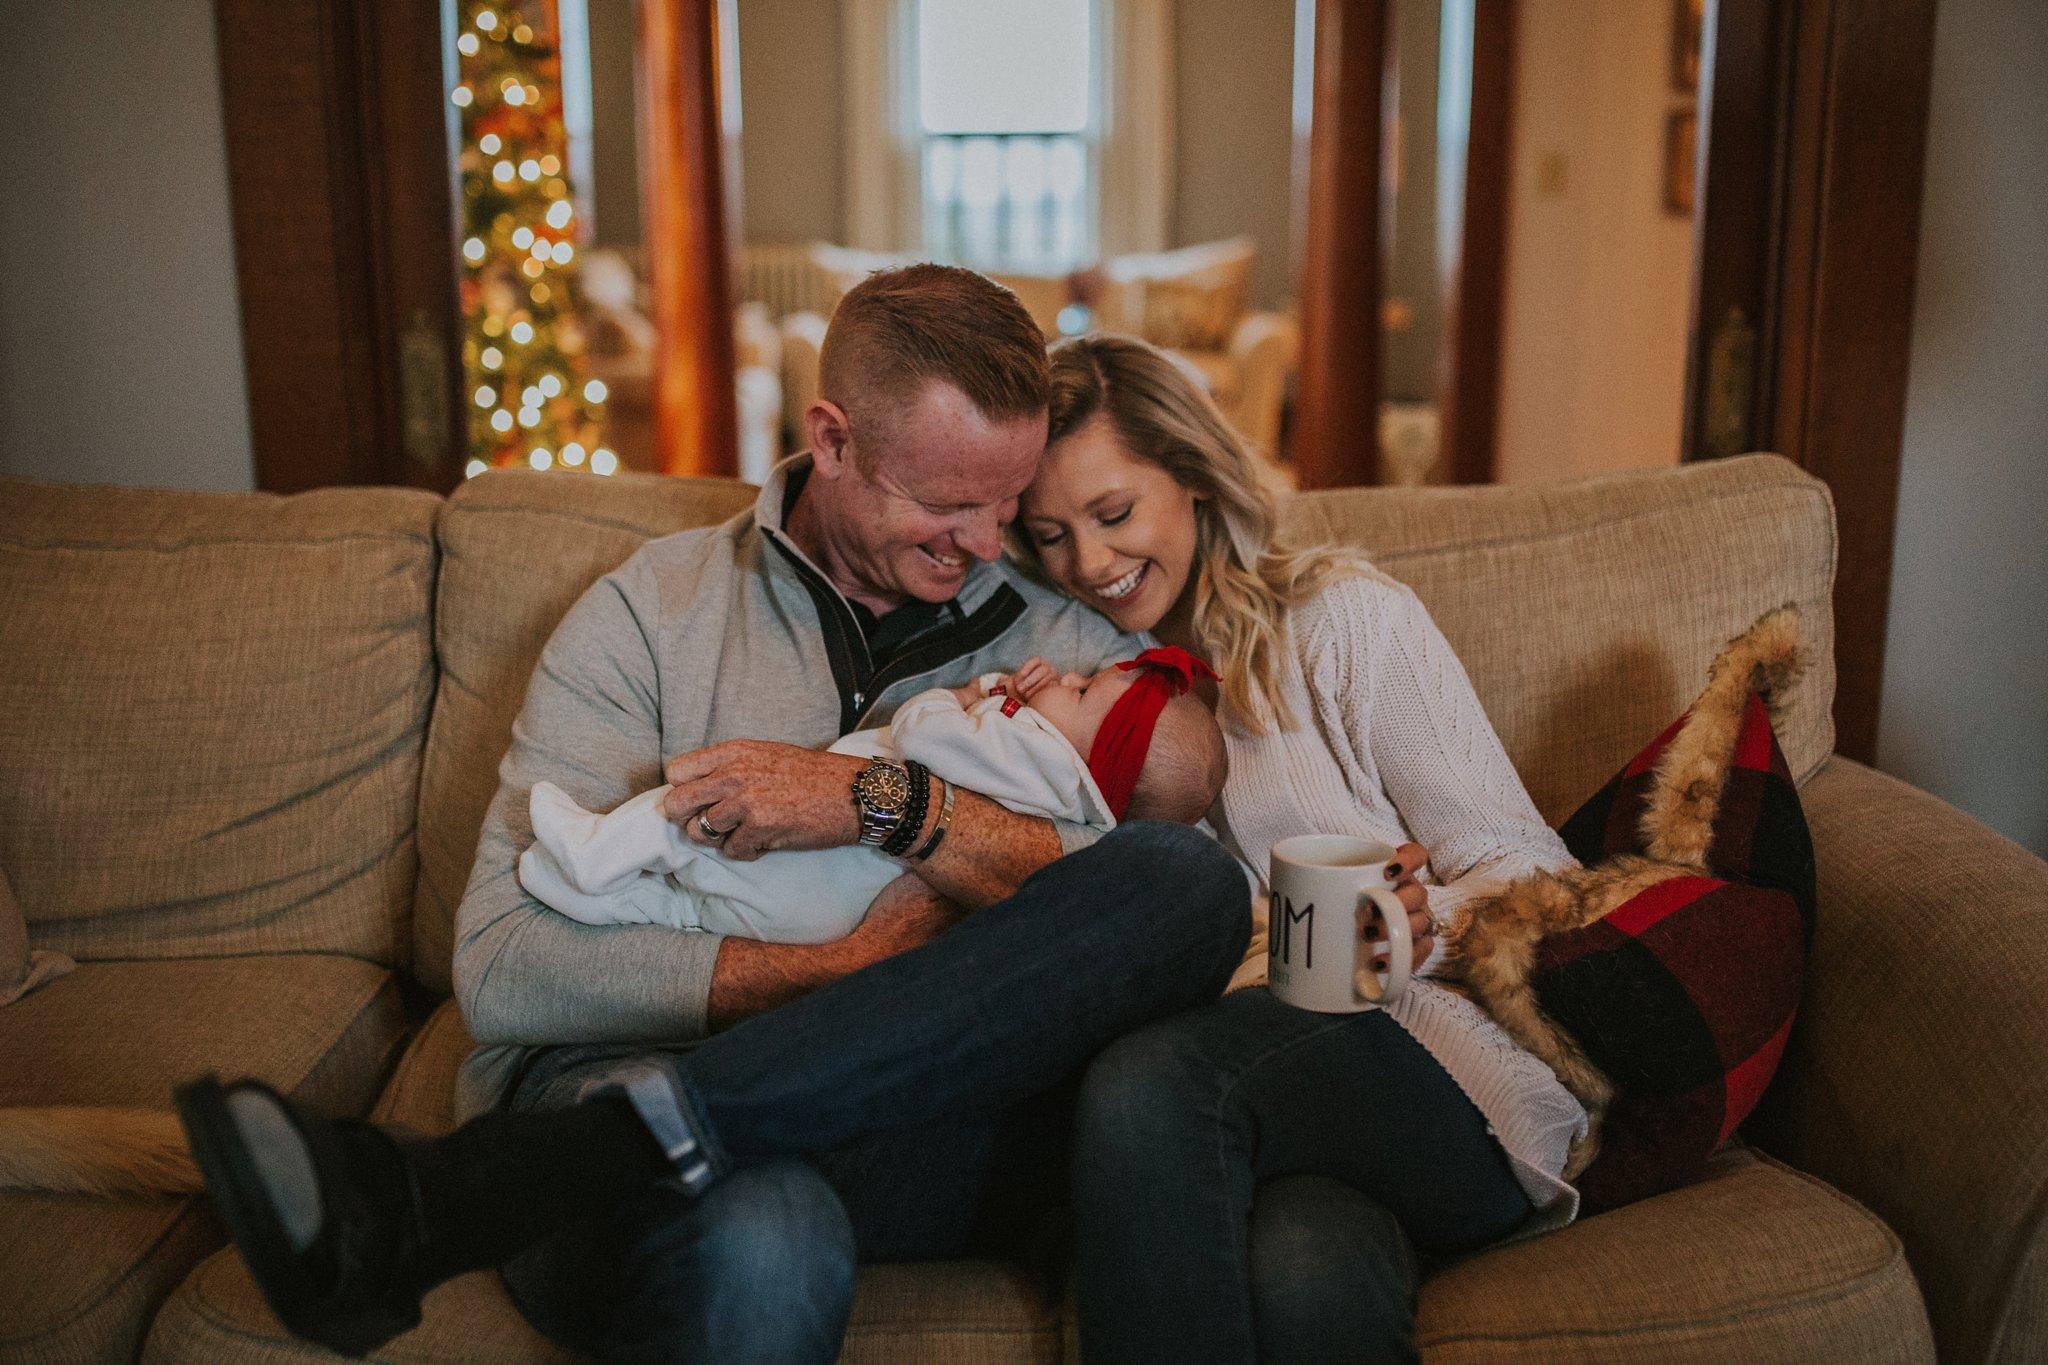 Edinburg Indiana Couple sharing their adoption story